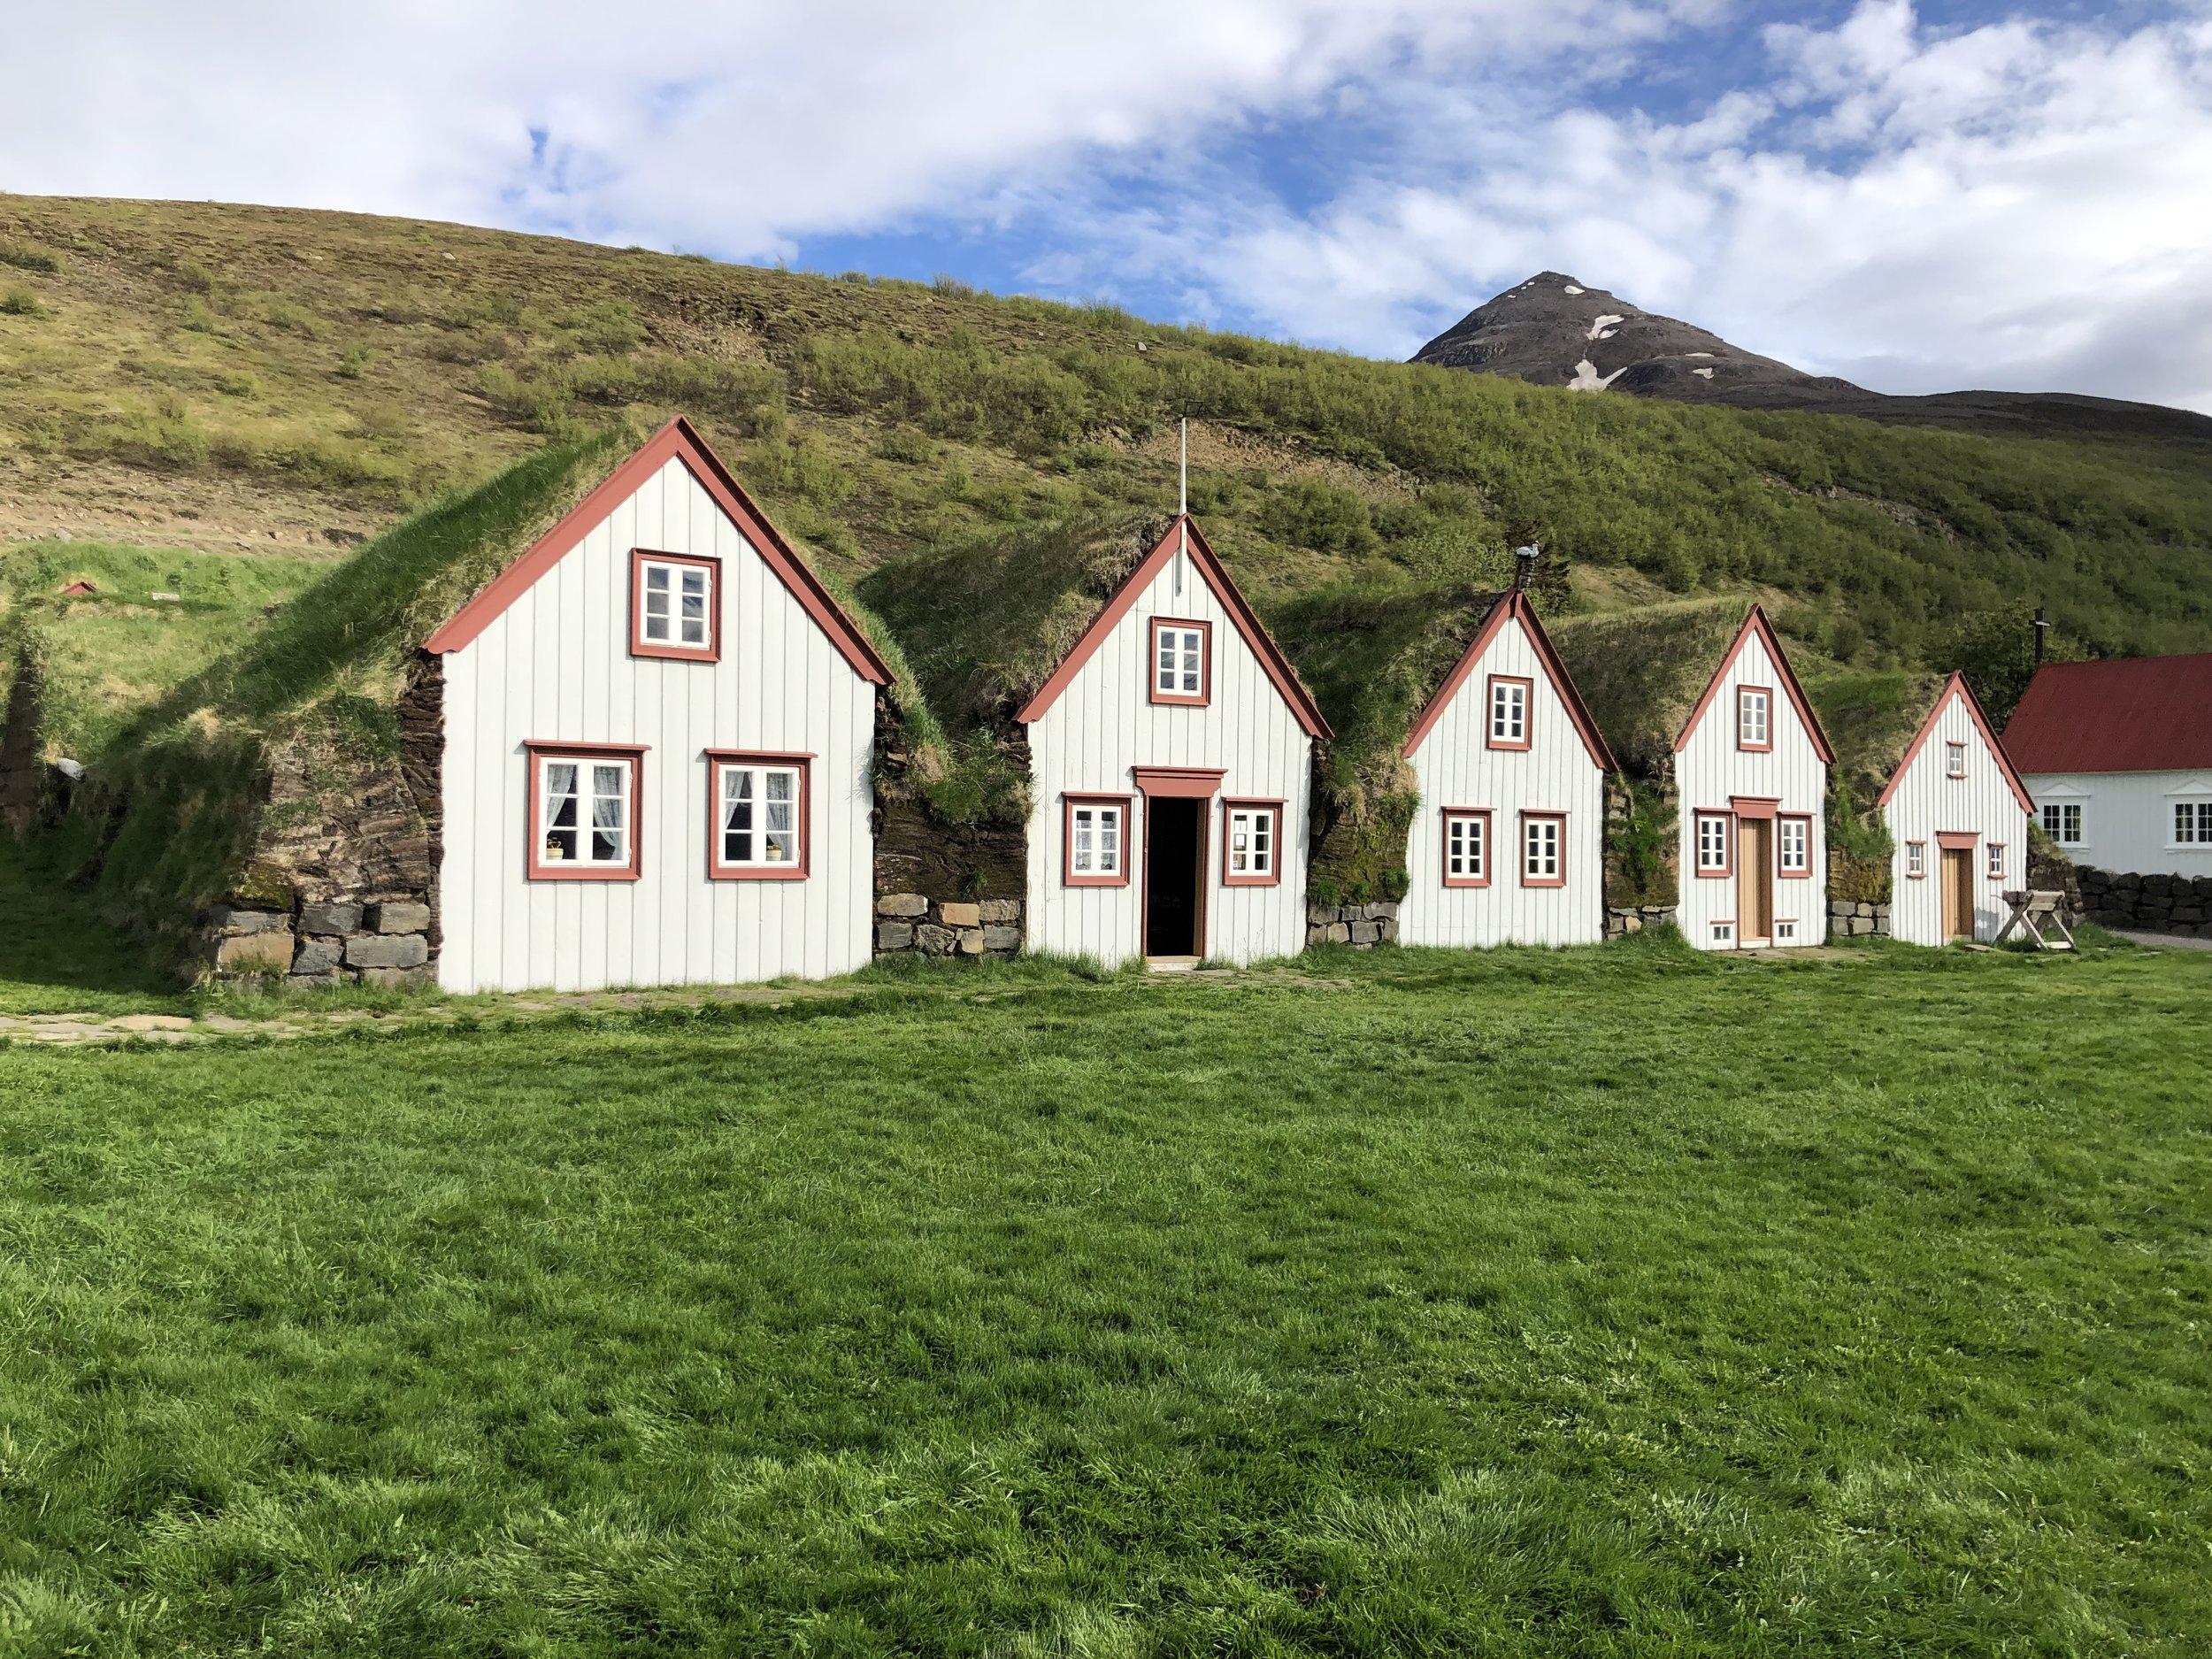 Traditional Icelandic sod houses.